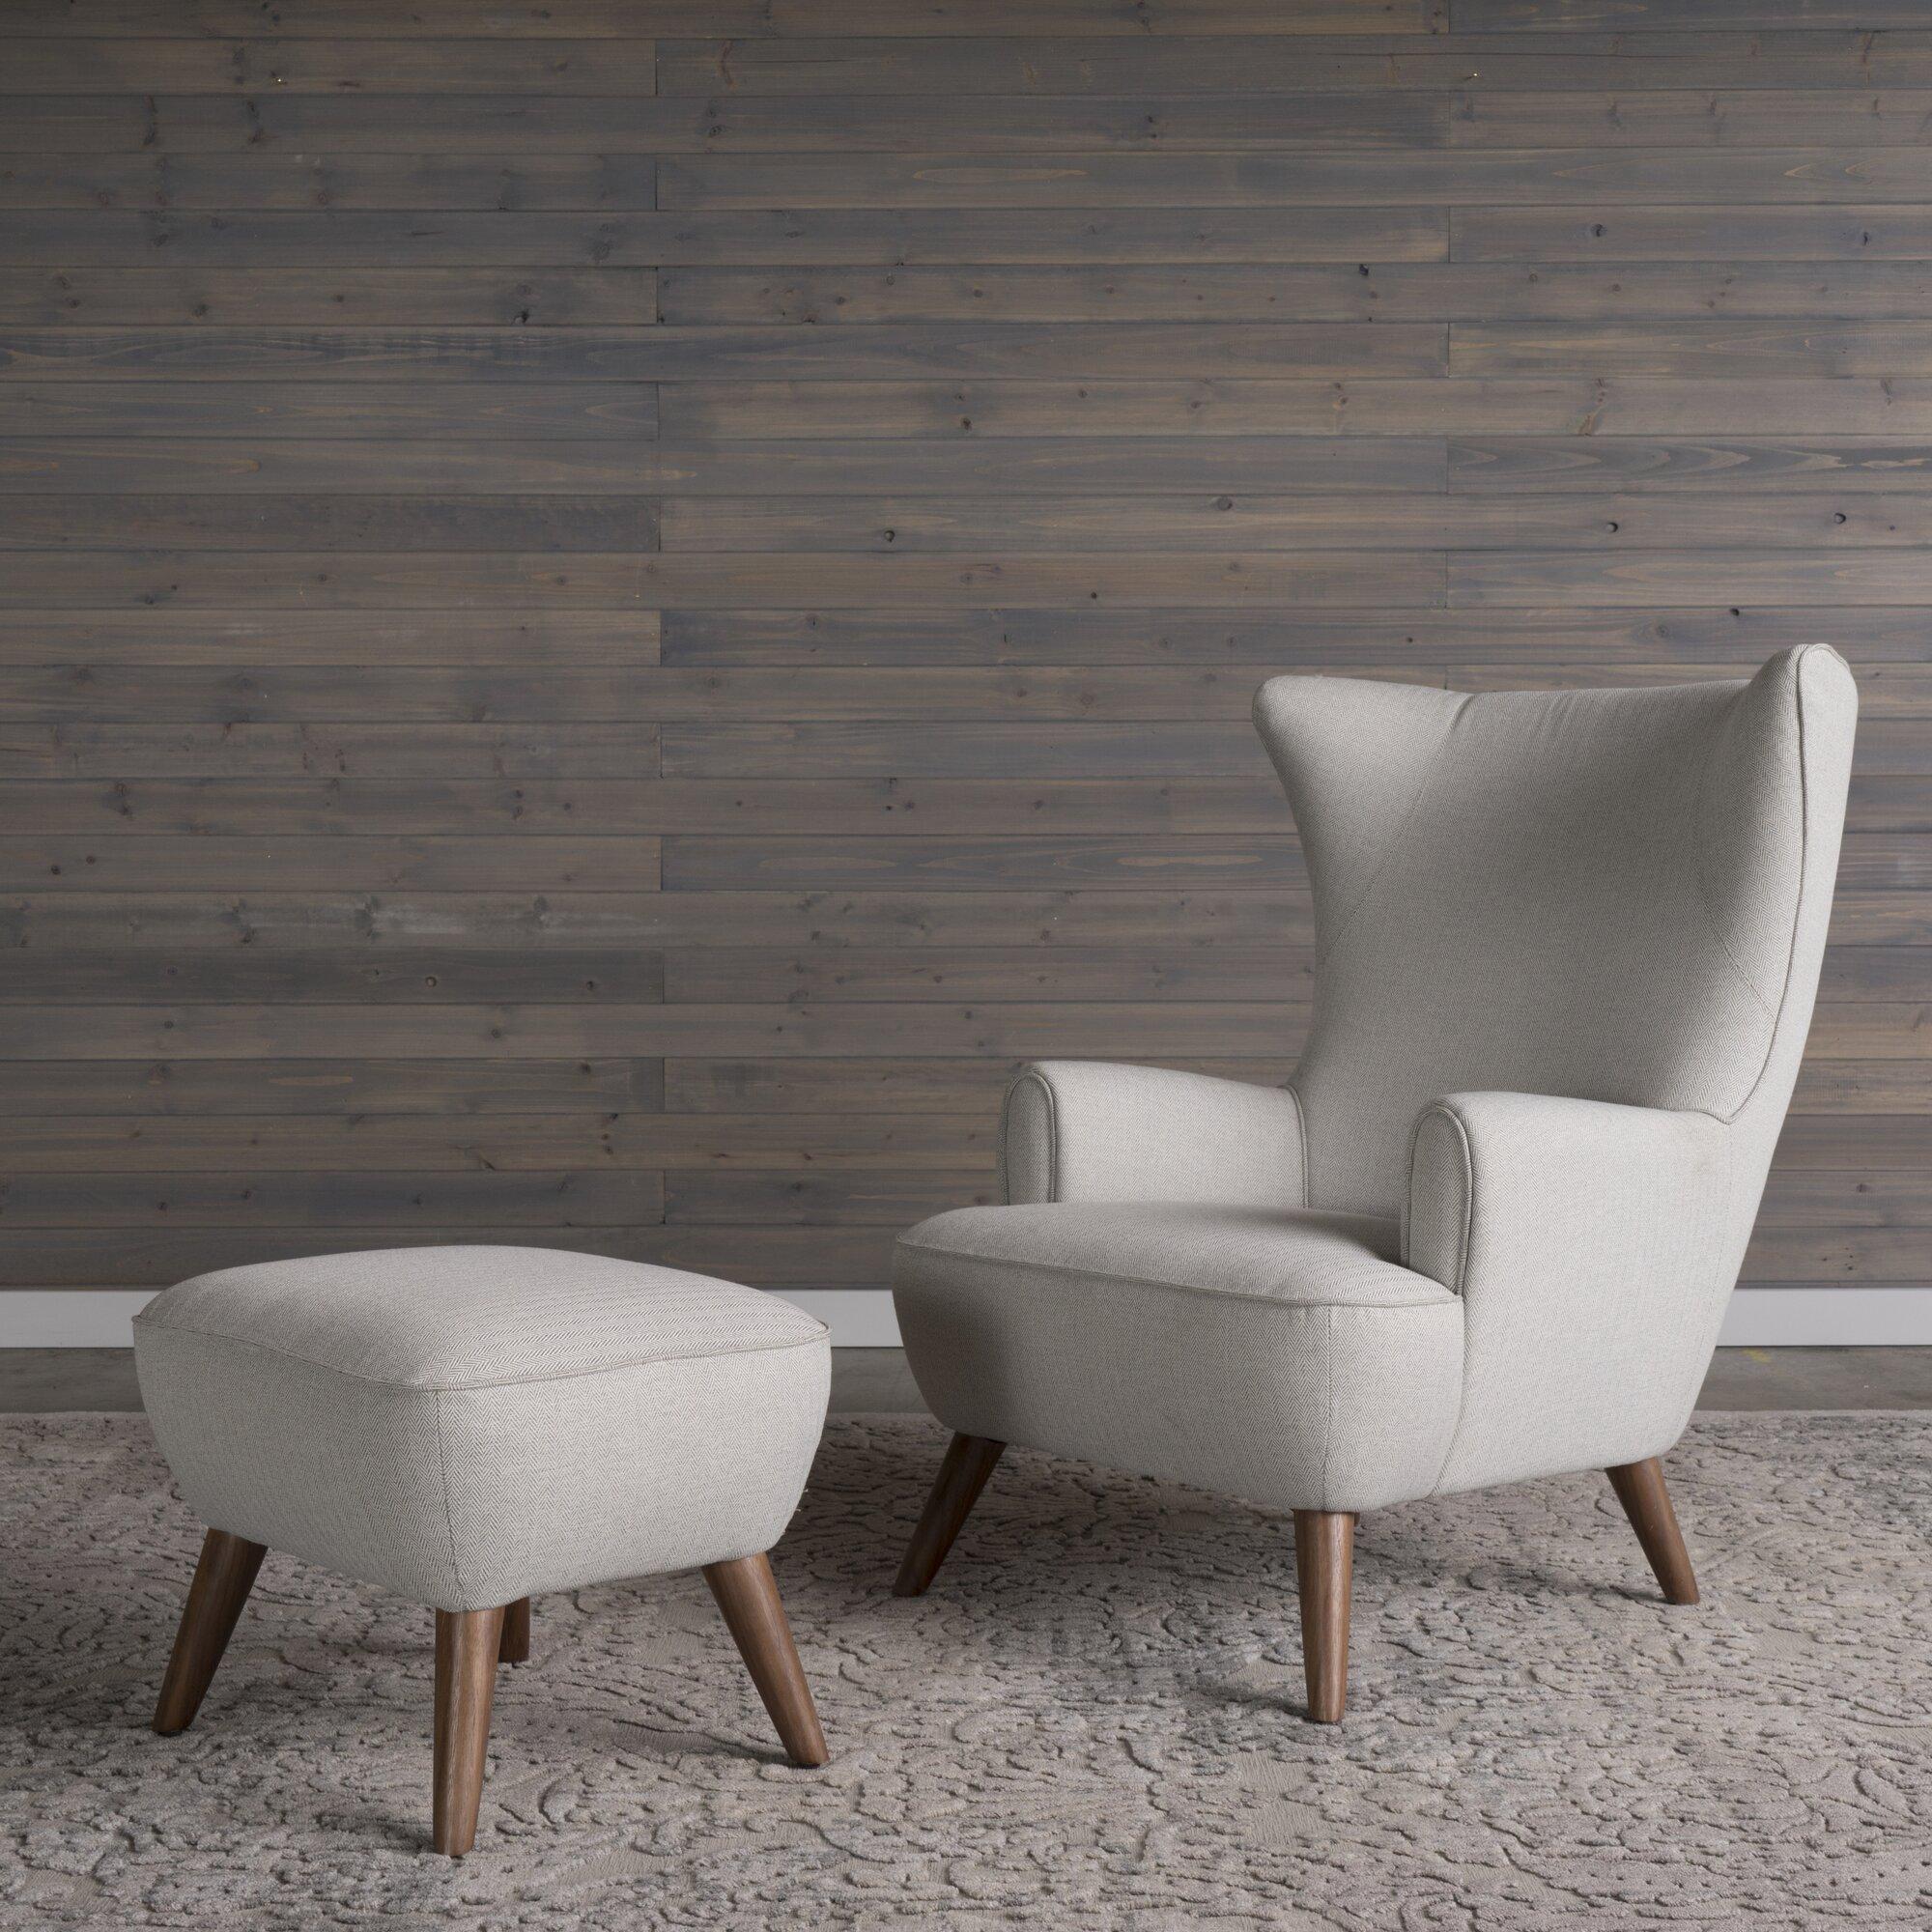 shelburne 5 piece living room set with high back chair - High Back Chairs For Living Room